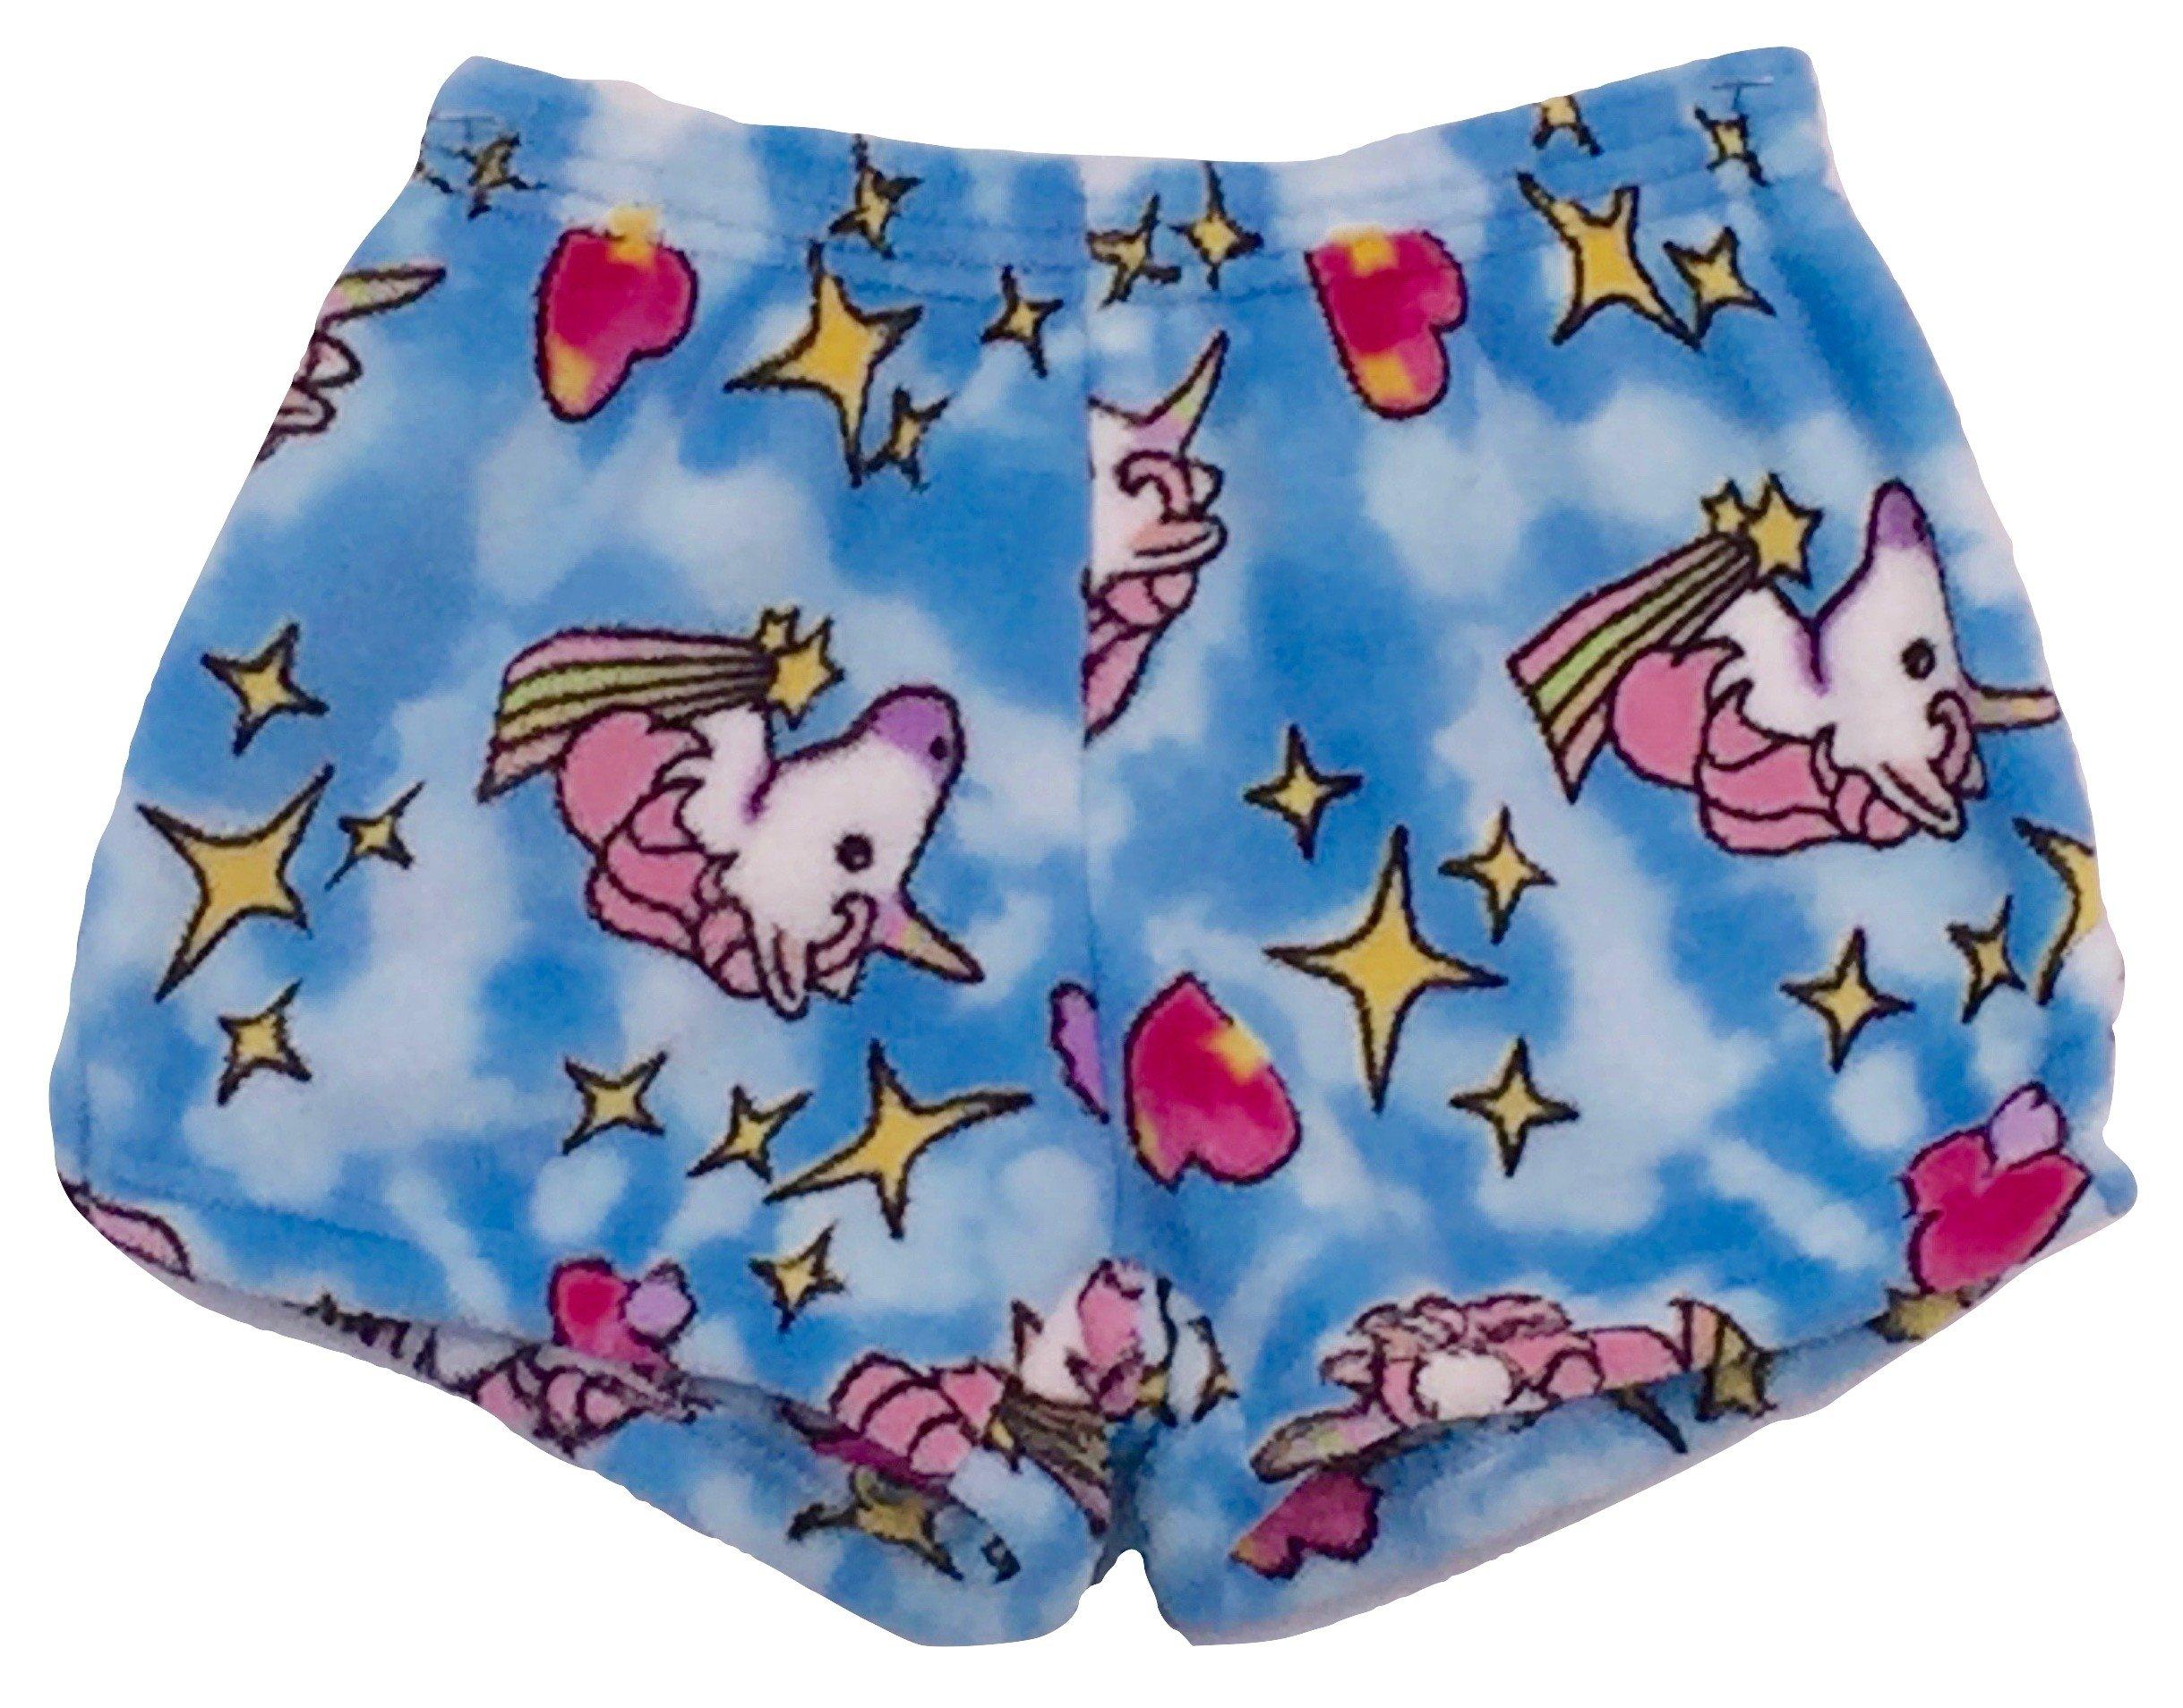 Made with Love and Kisses Girl's Fuzzy Plush Pajama/Loungewear Shorts - Blue Unicorns - 10/12